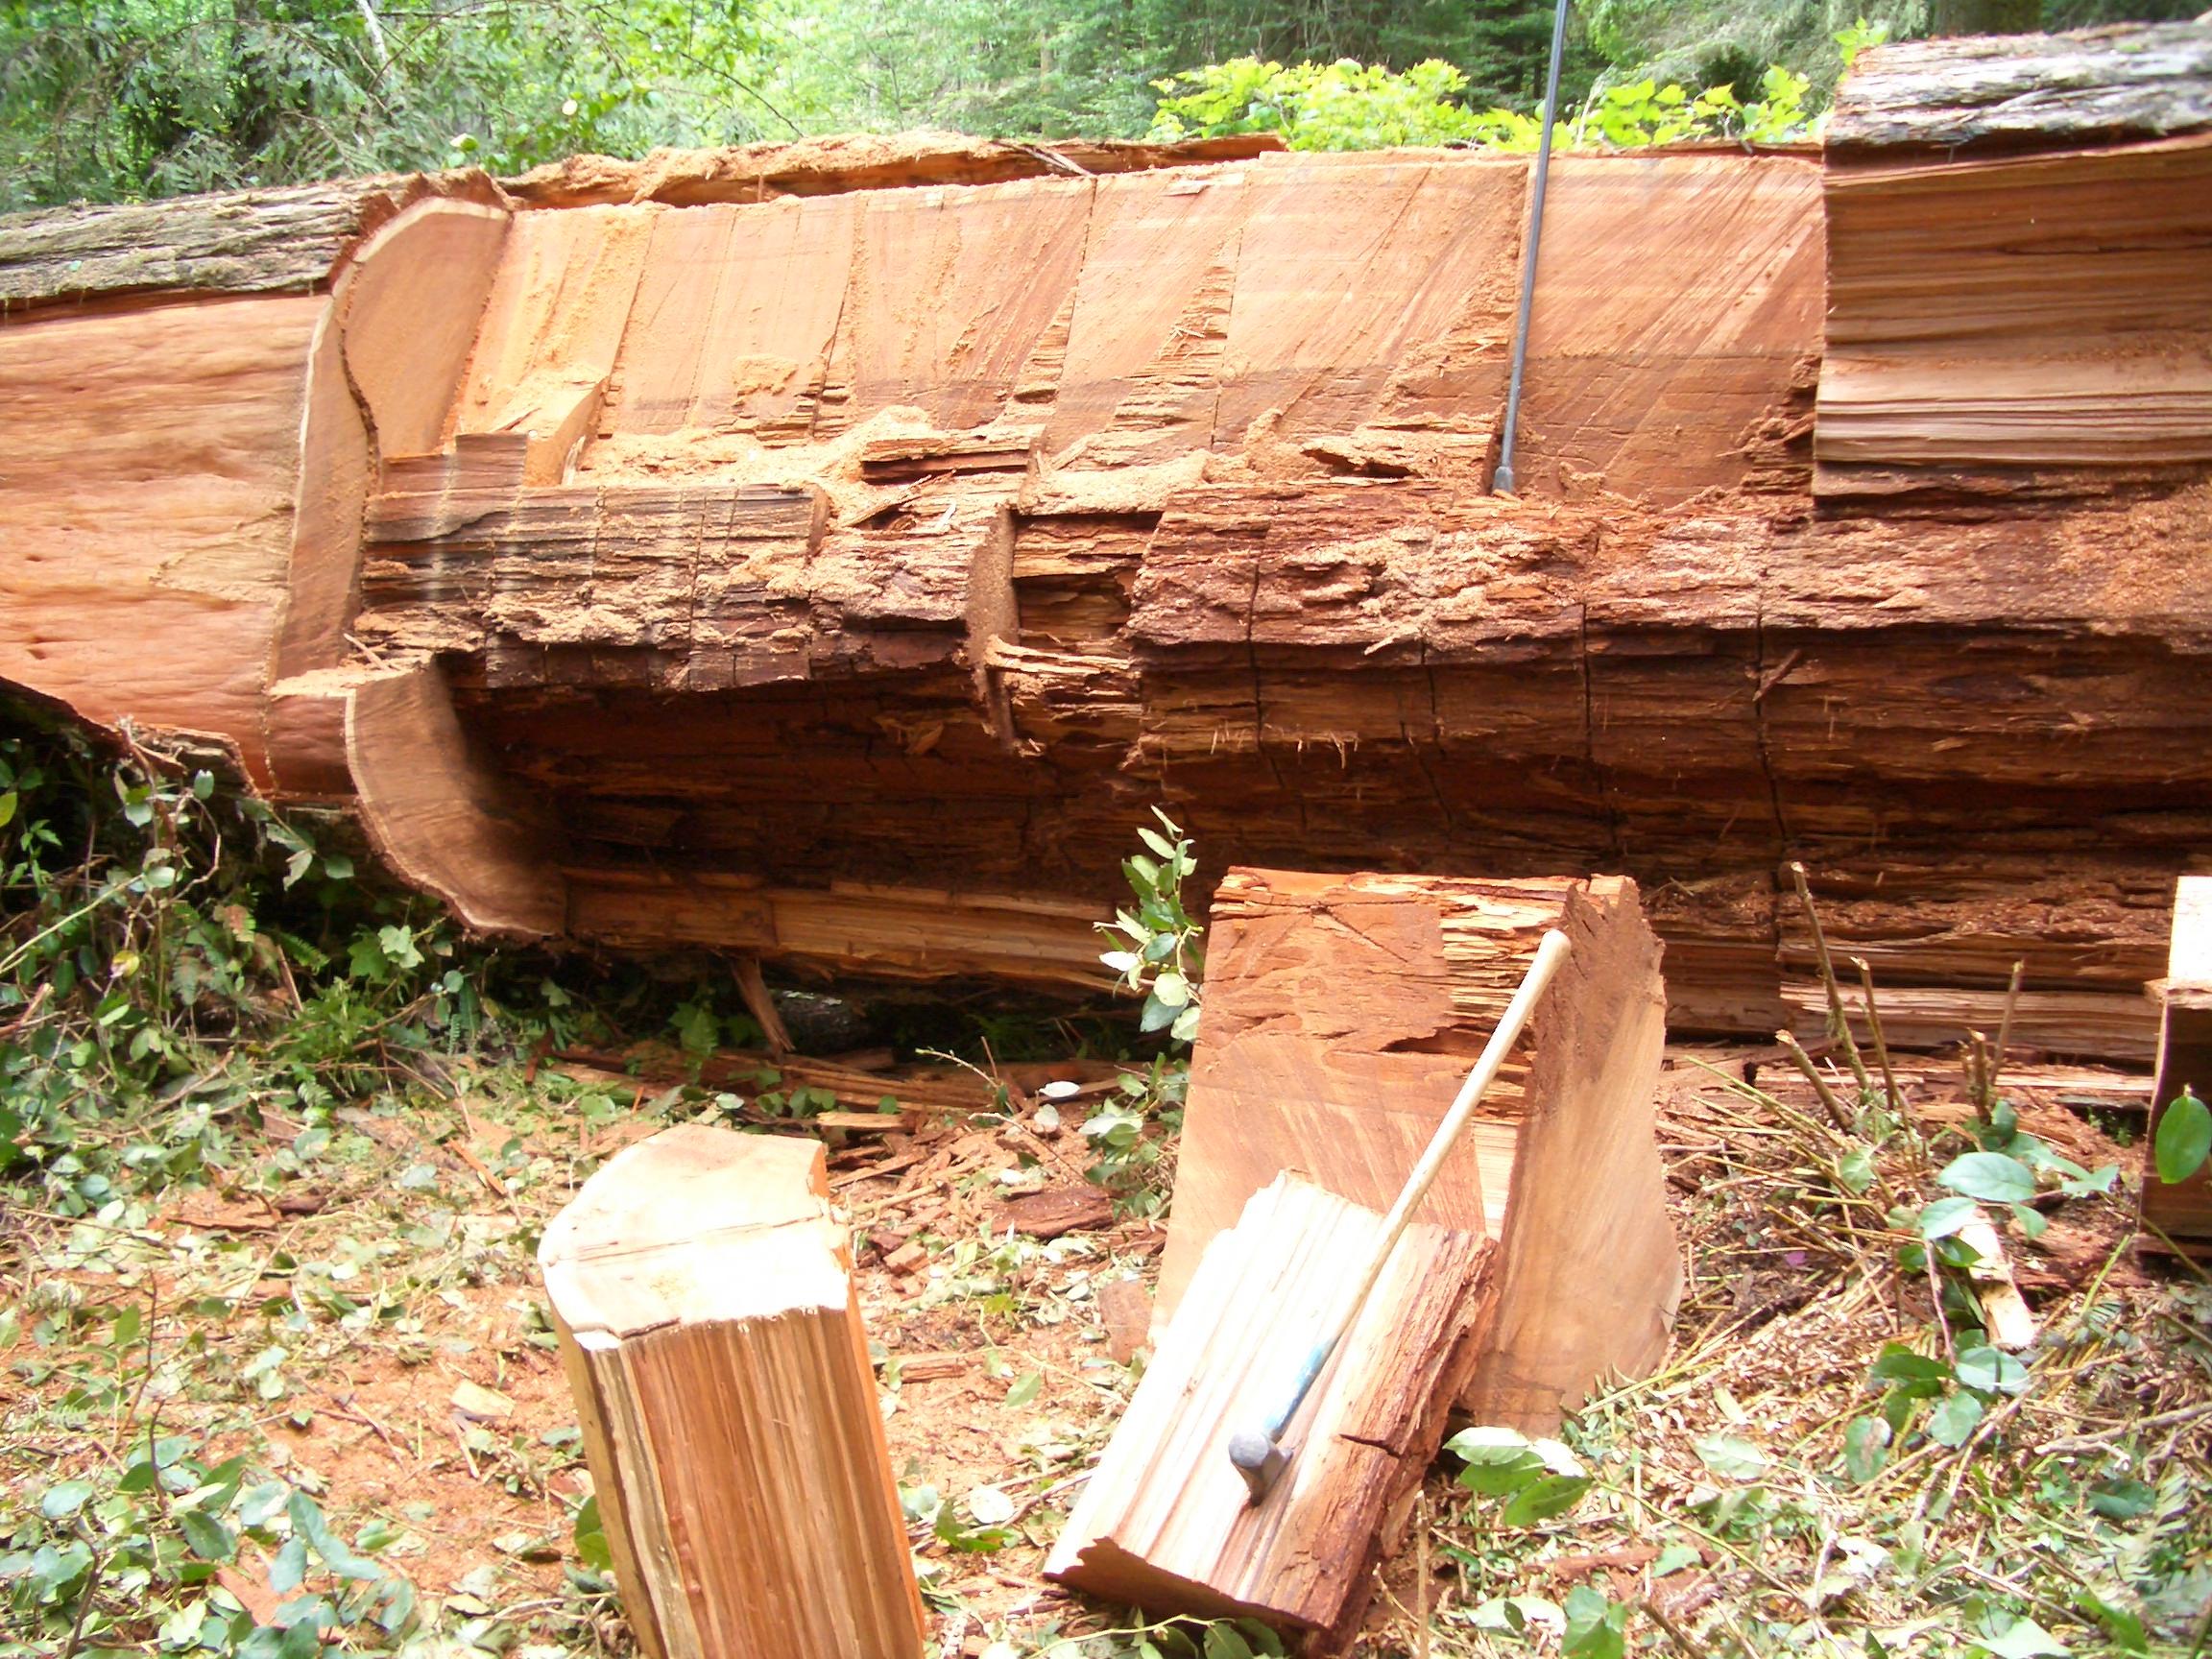 file redwood tree sequoia sempervirens fallen over orick horse trail jpg wikimedia commons. Black Bedroom Furniture Sets. Home Design Ideas